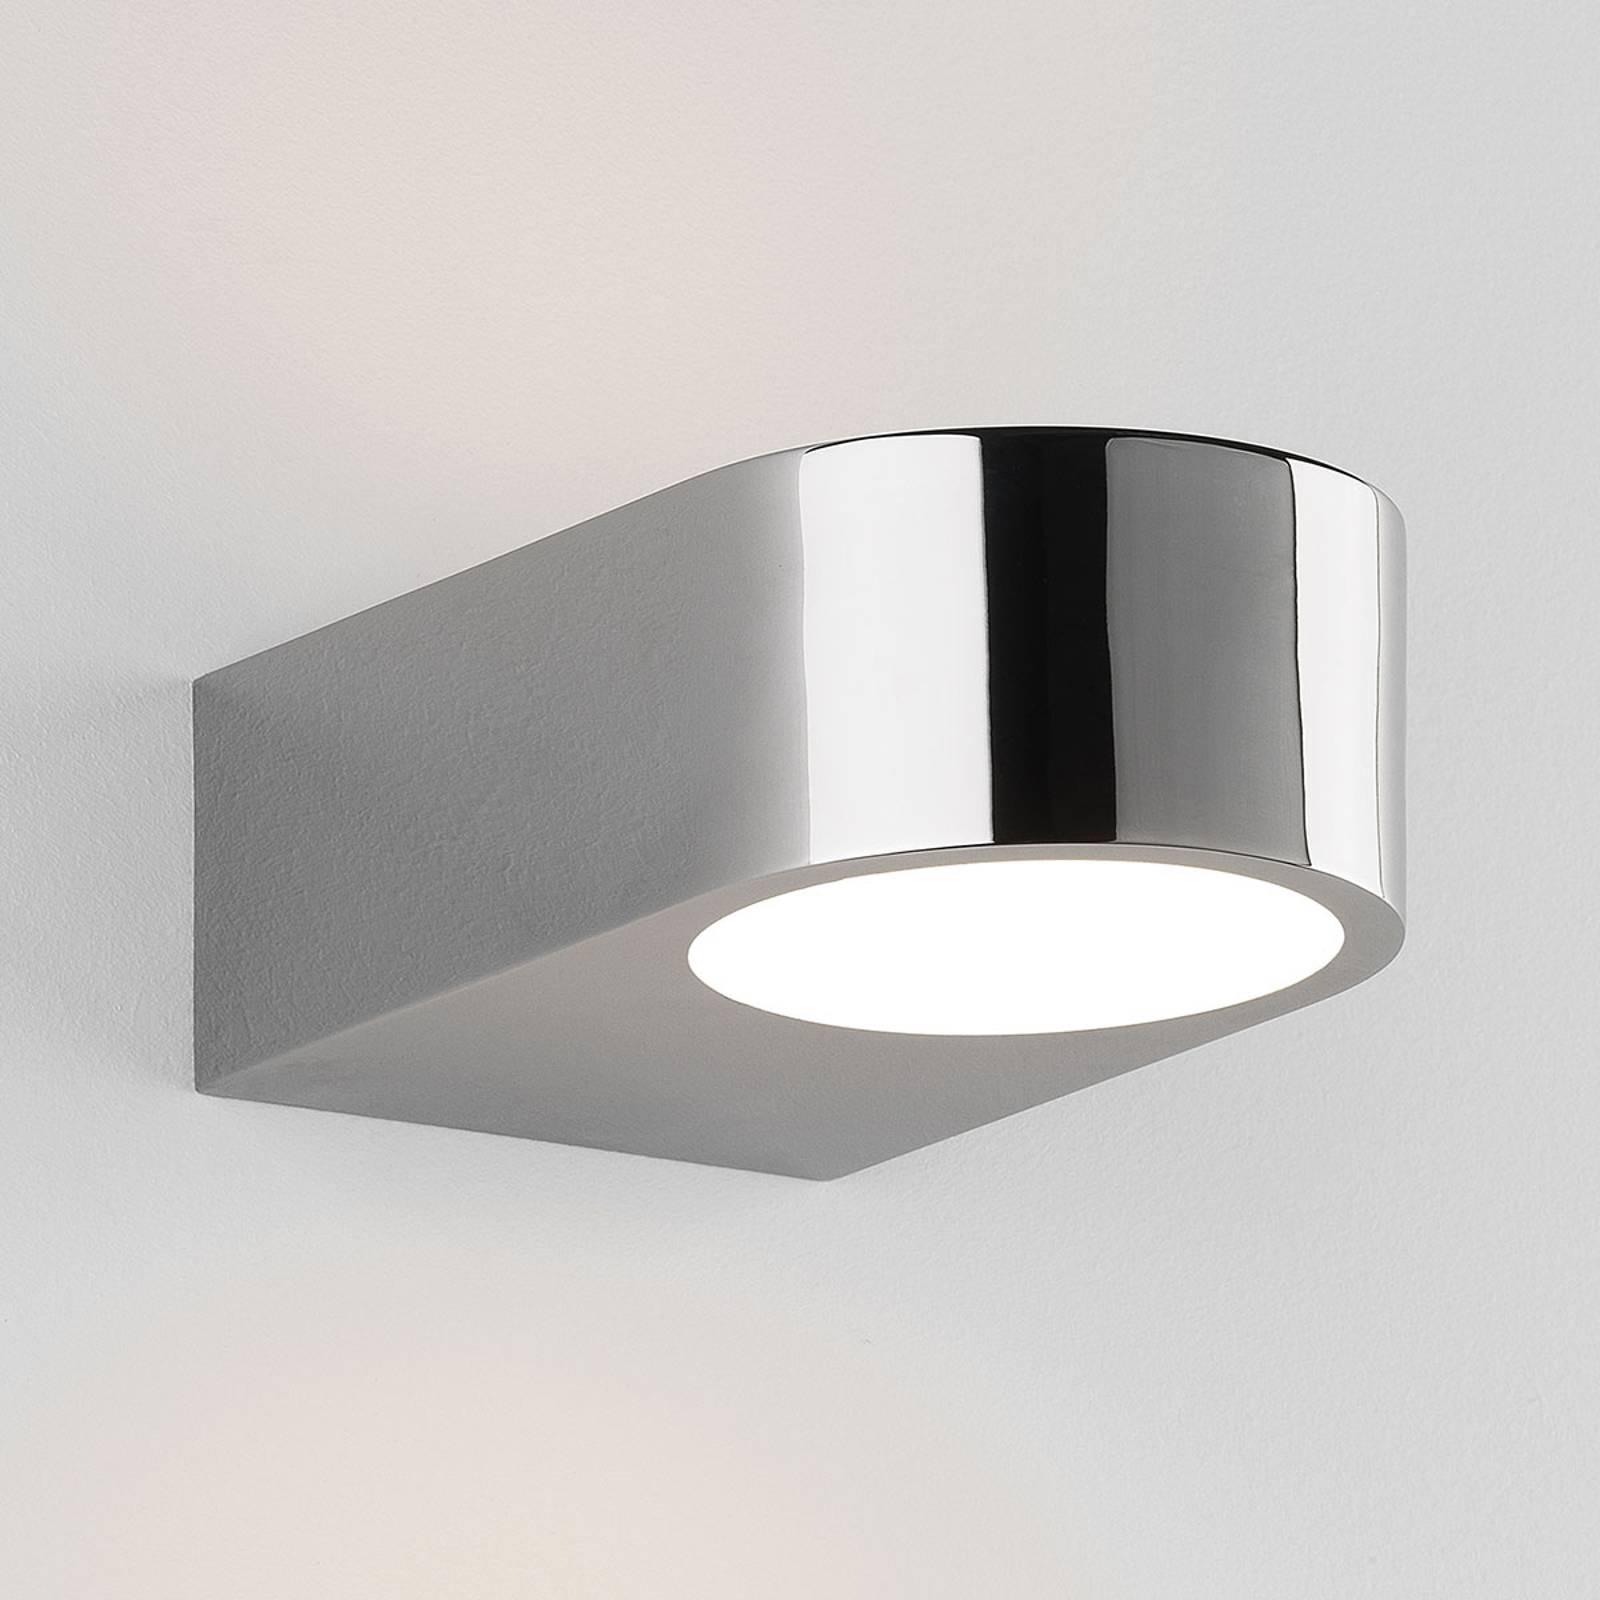 Astro Epsilon badkamer wandlamp met LED